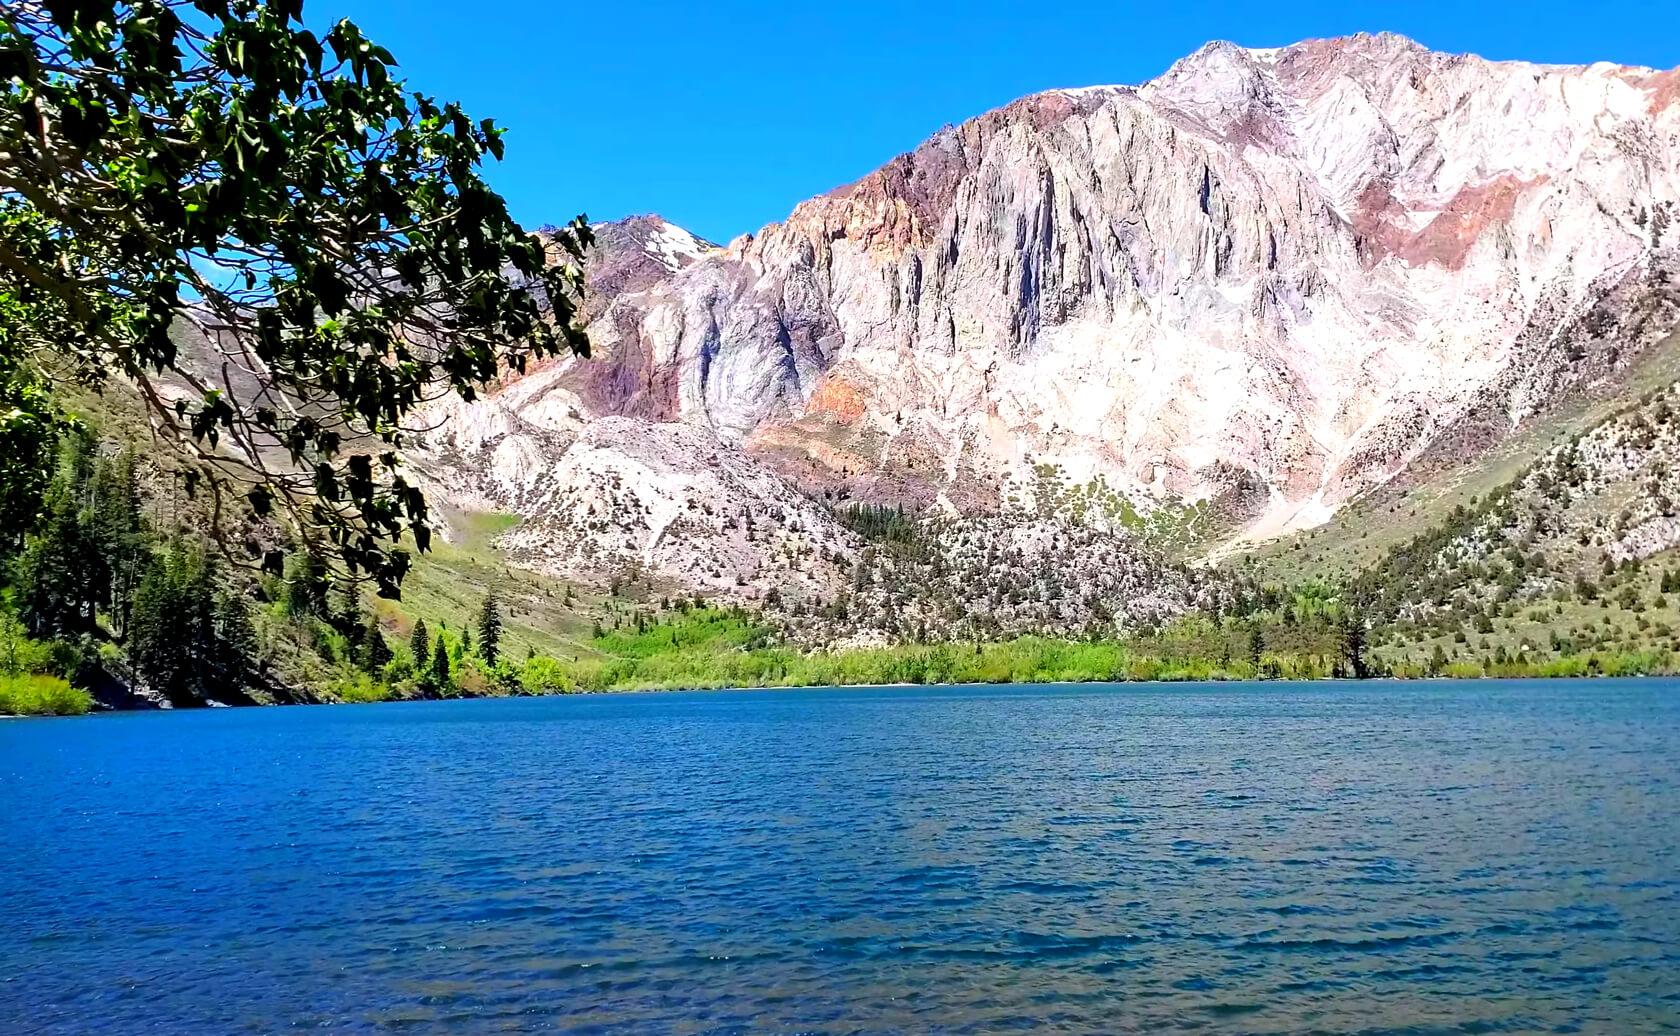 Convict-Lake-Reservoir-Fishing-Guide-Report-California-08